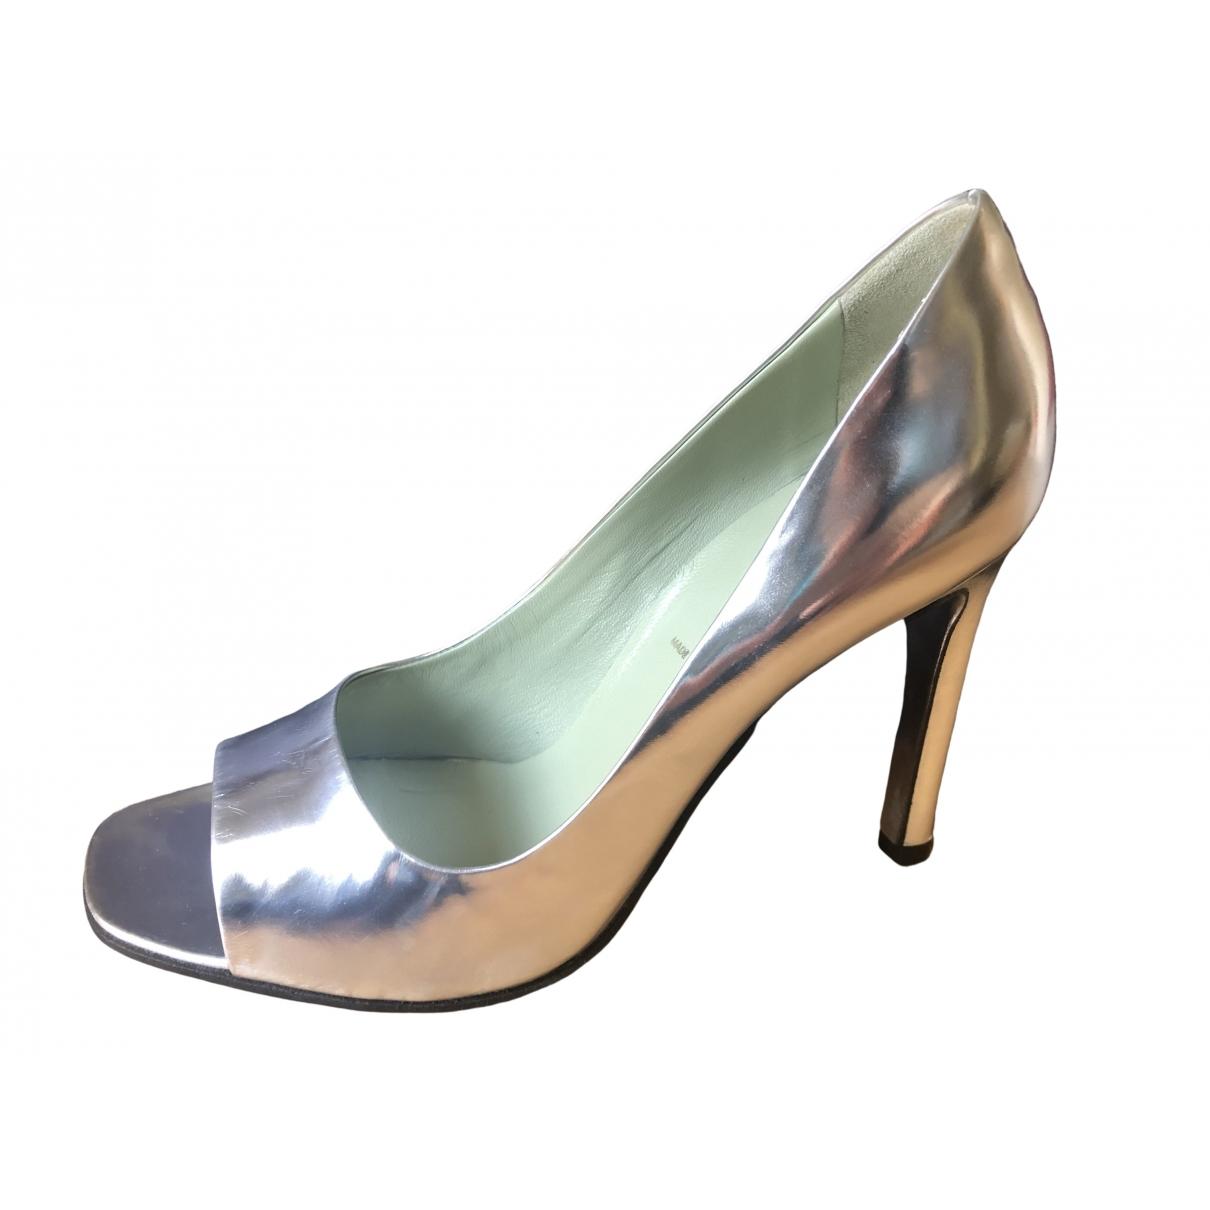 Prada \N Silver Patent leather Heels for Women 36 IT